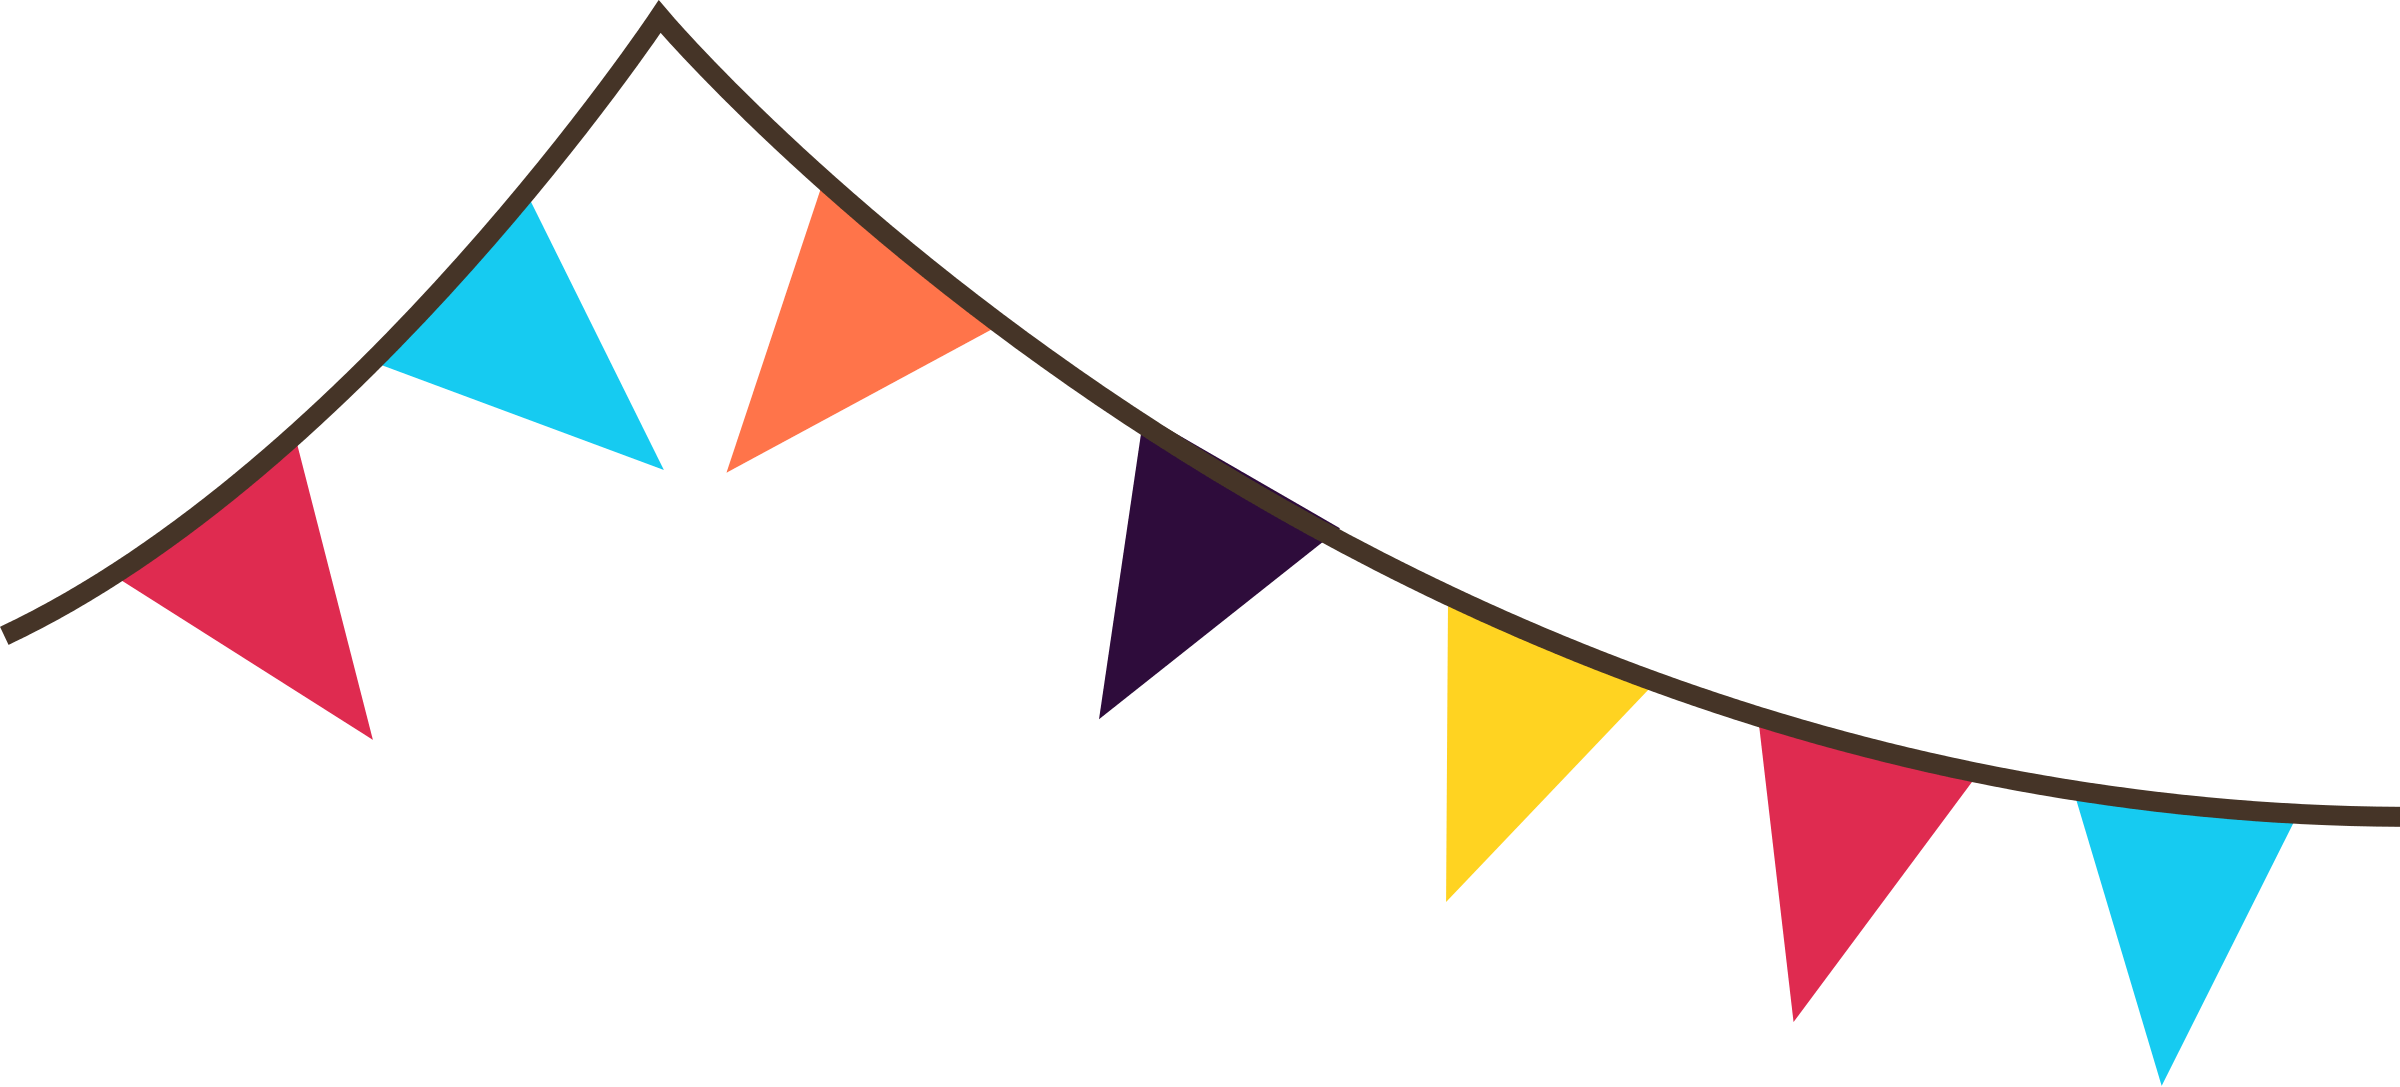 2400x1087 Carnival Flag Cliparts 186491